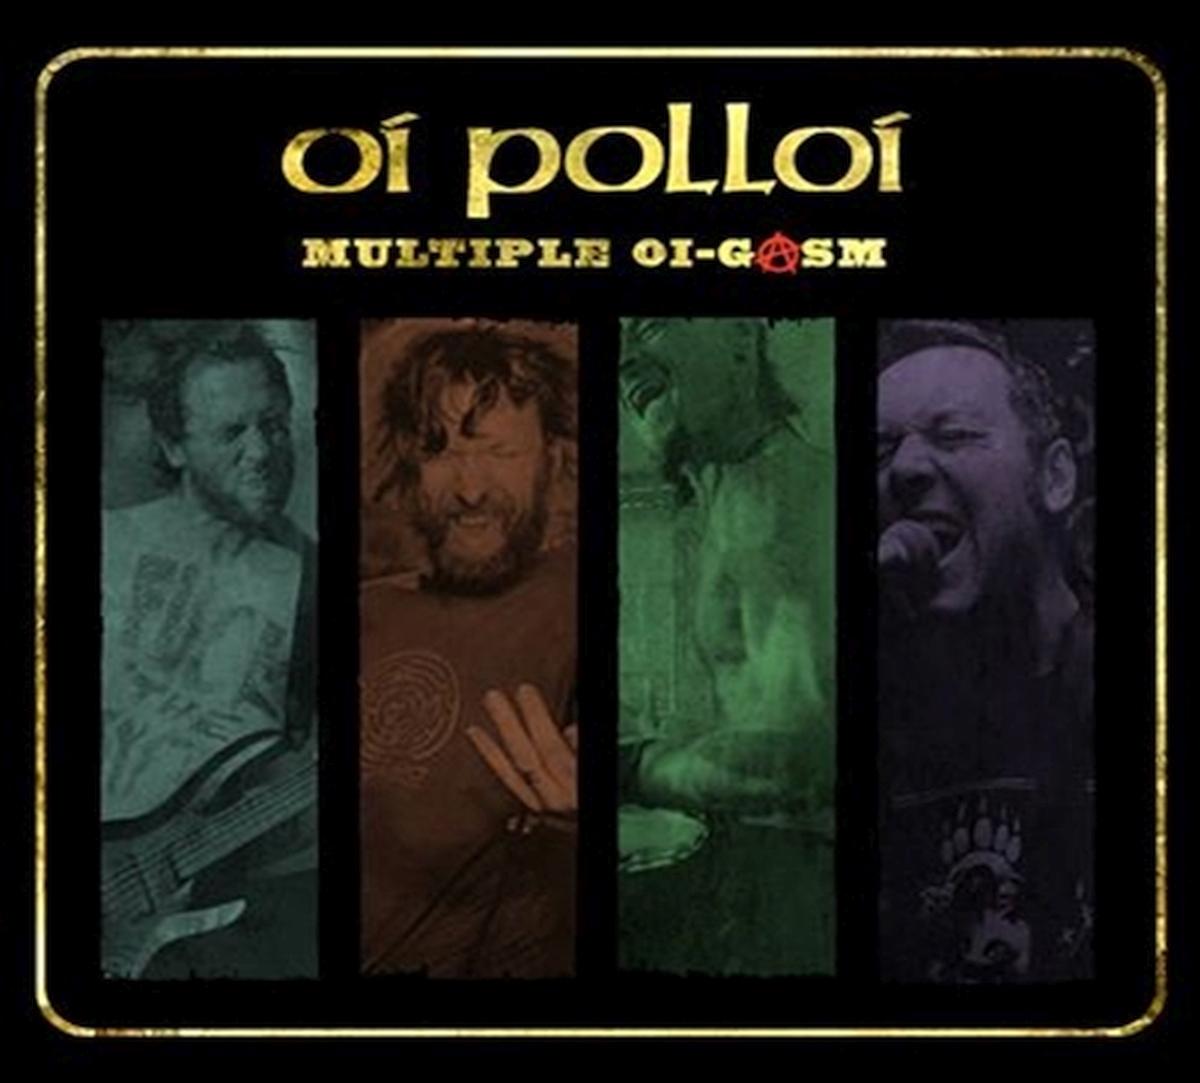 Oi Polloi | Multiple Oi-Gasm | 7